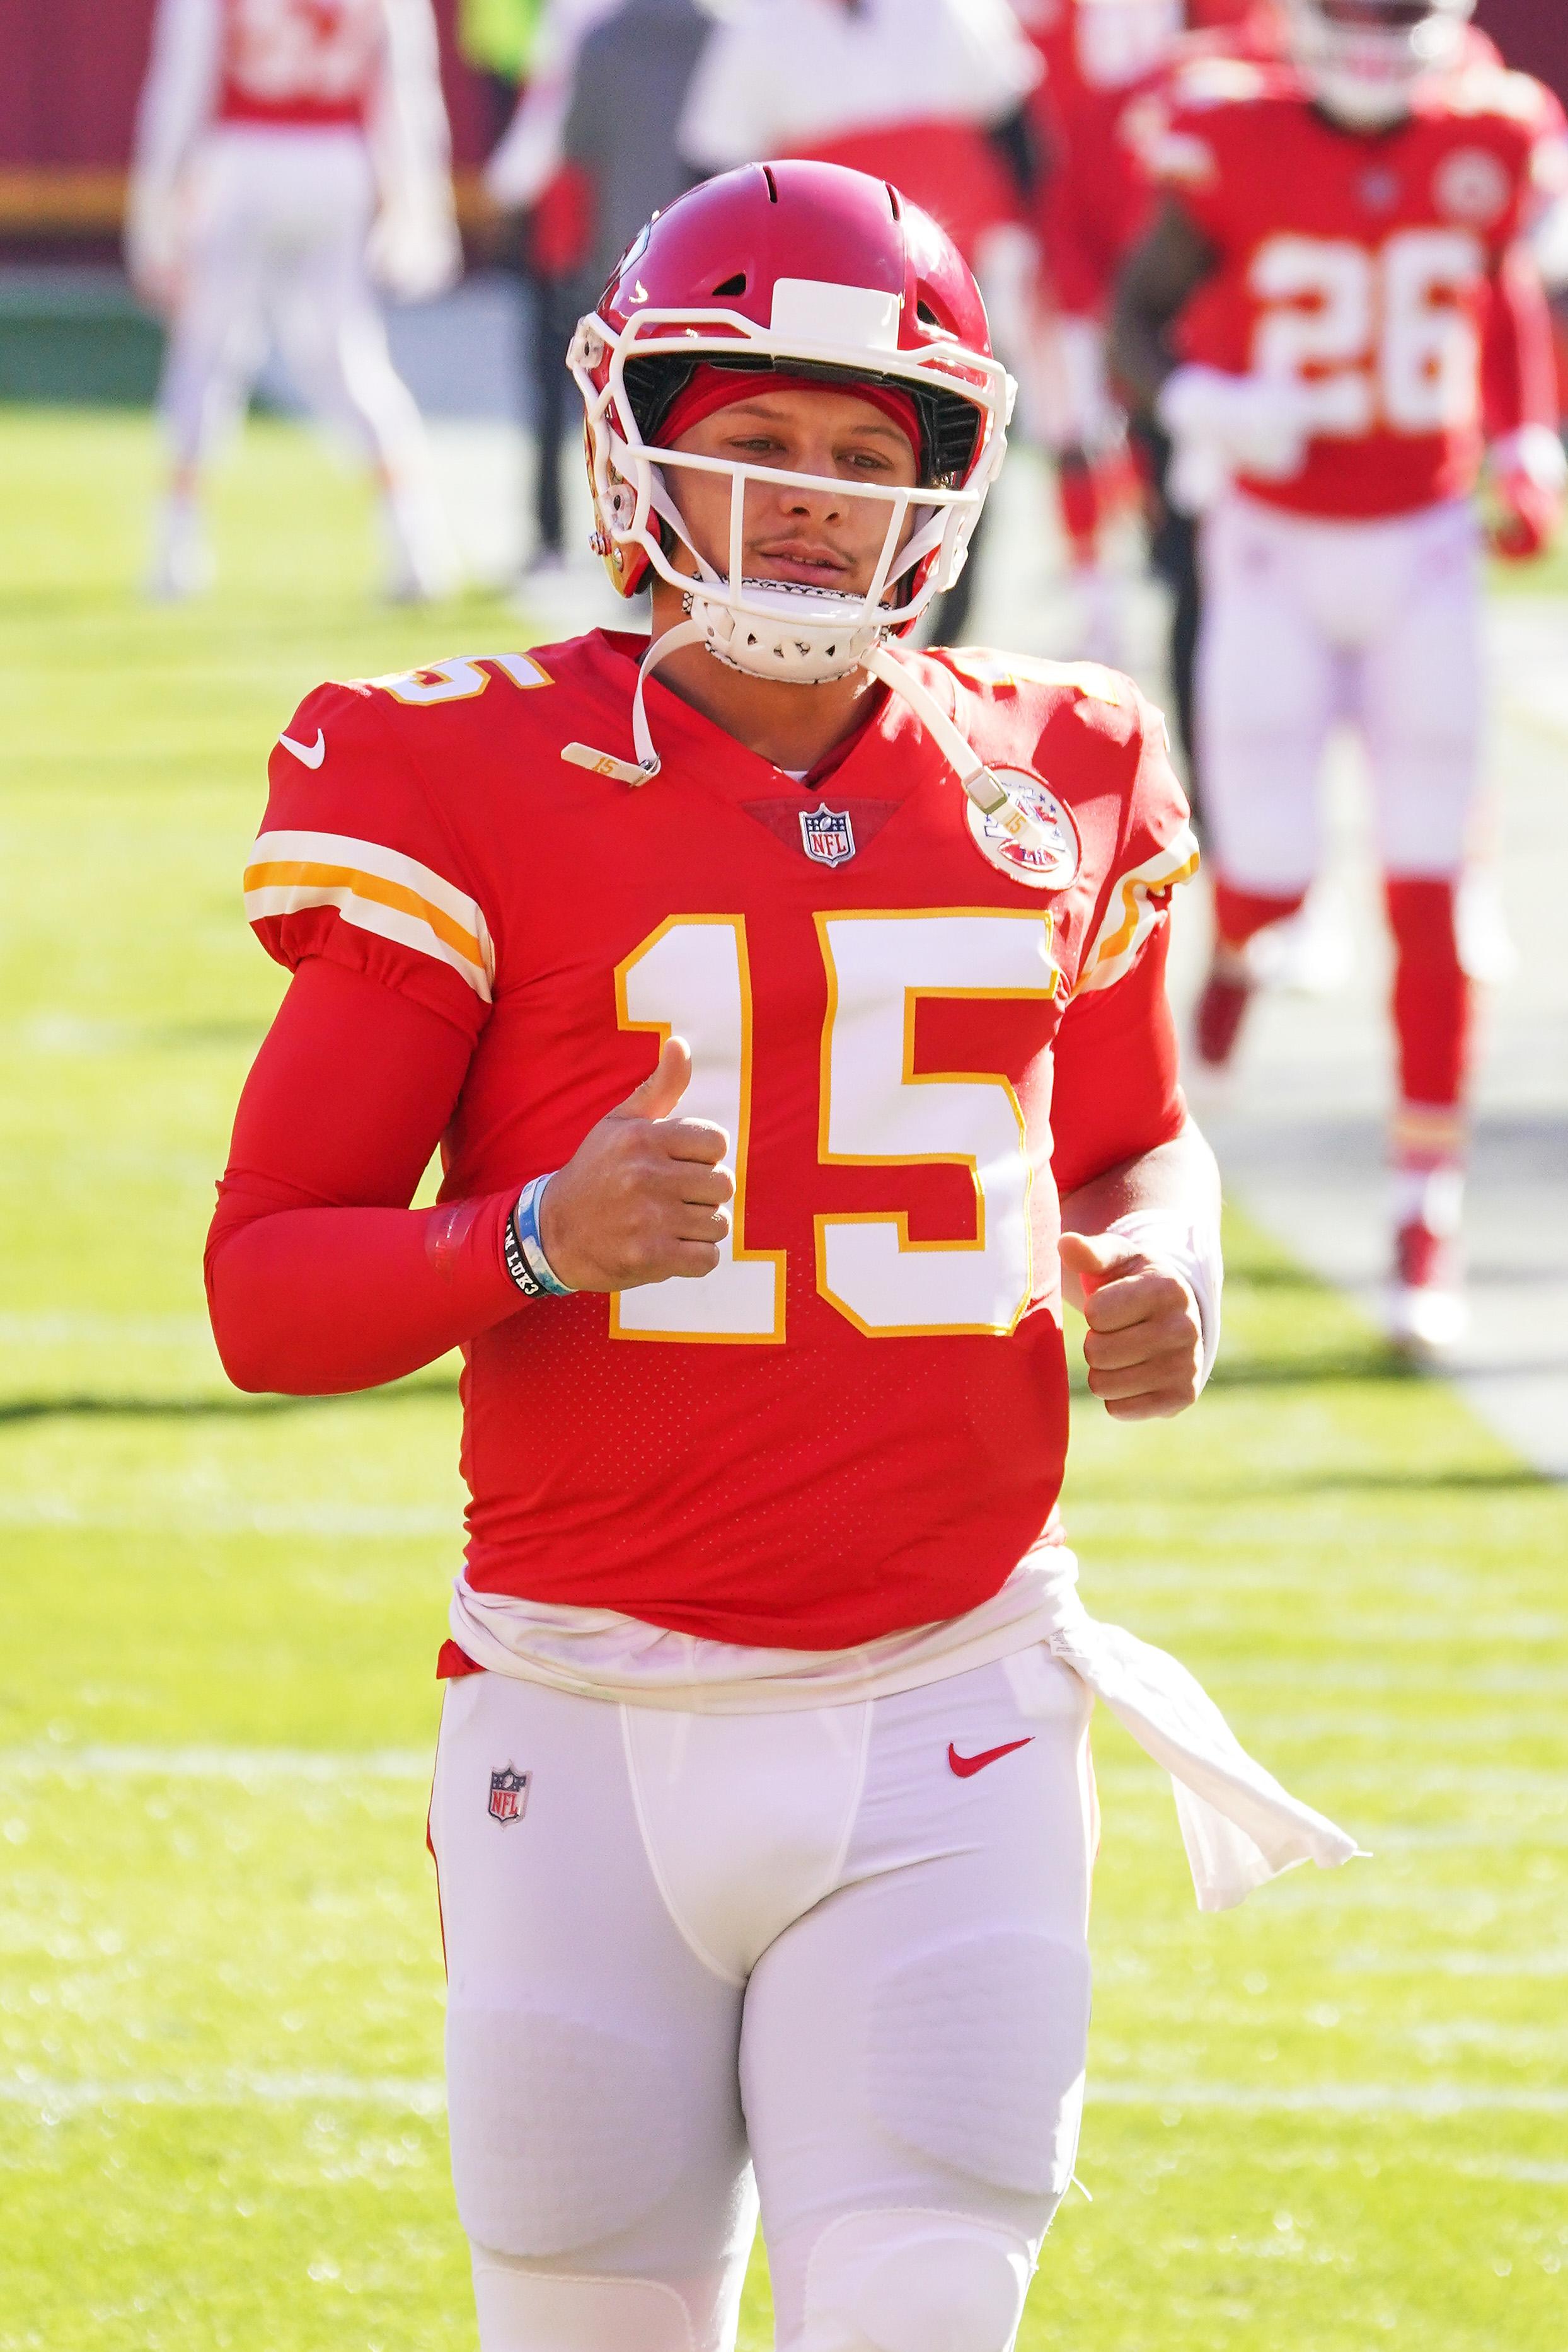 NFL: Atlanta Falcons at Kansas City Chiefs